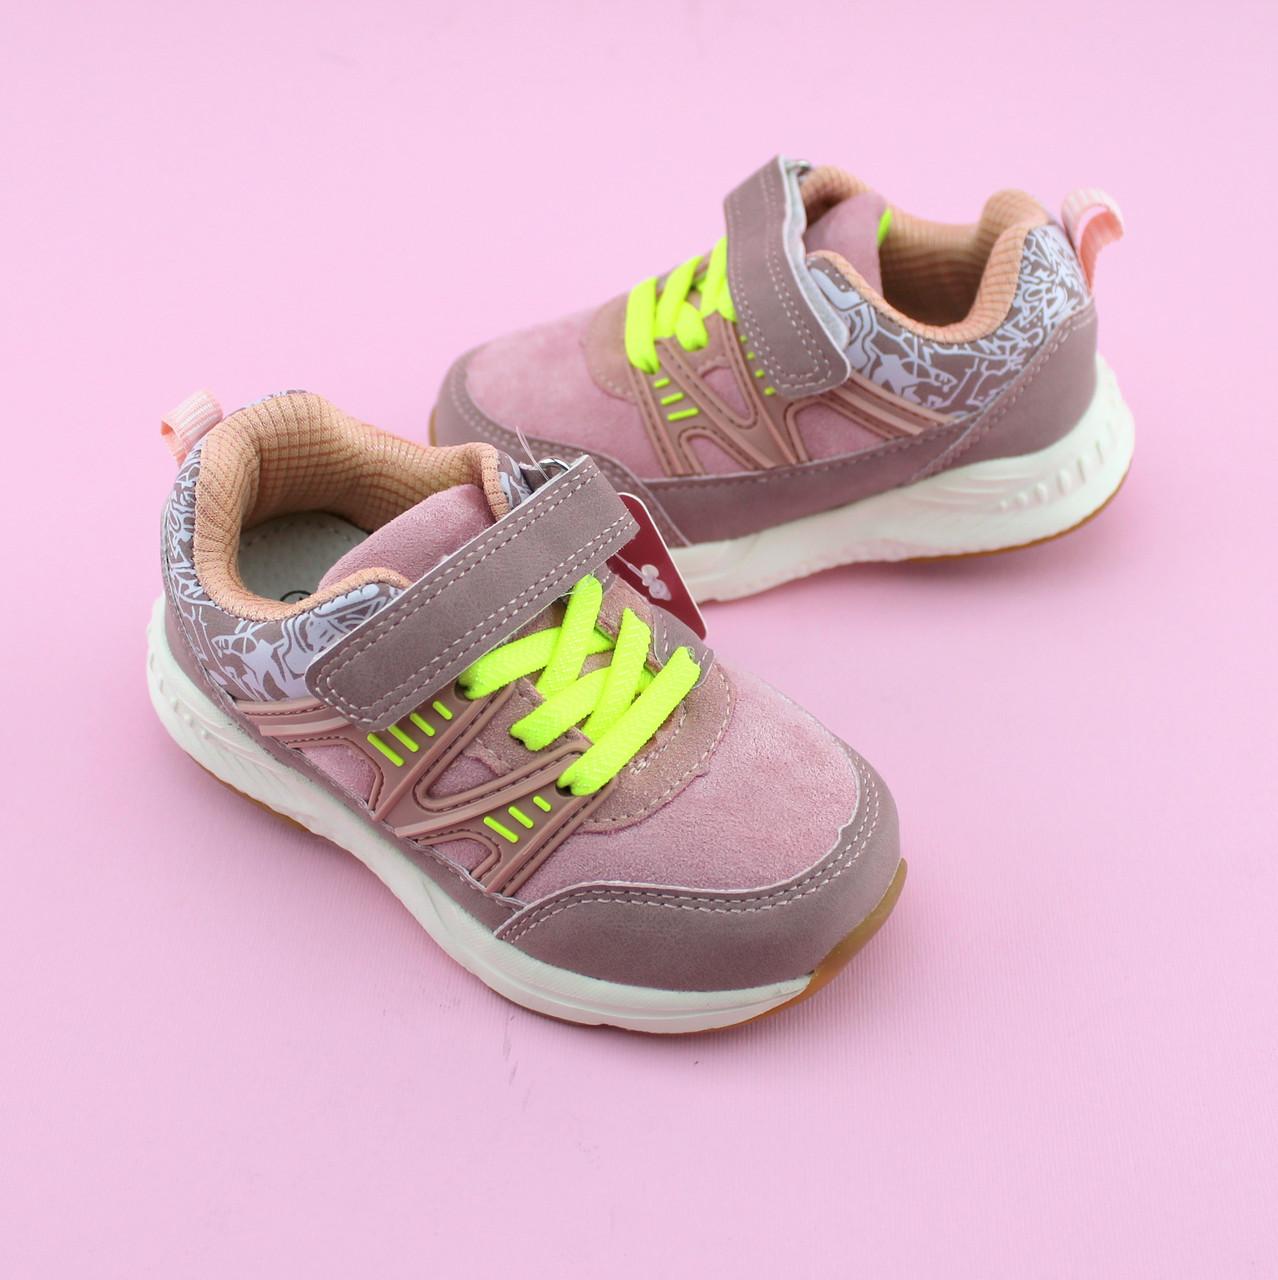 Кроссовки для девочки цвета Пудра тм Том.М размер 21,22